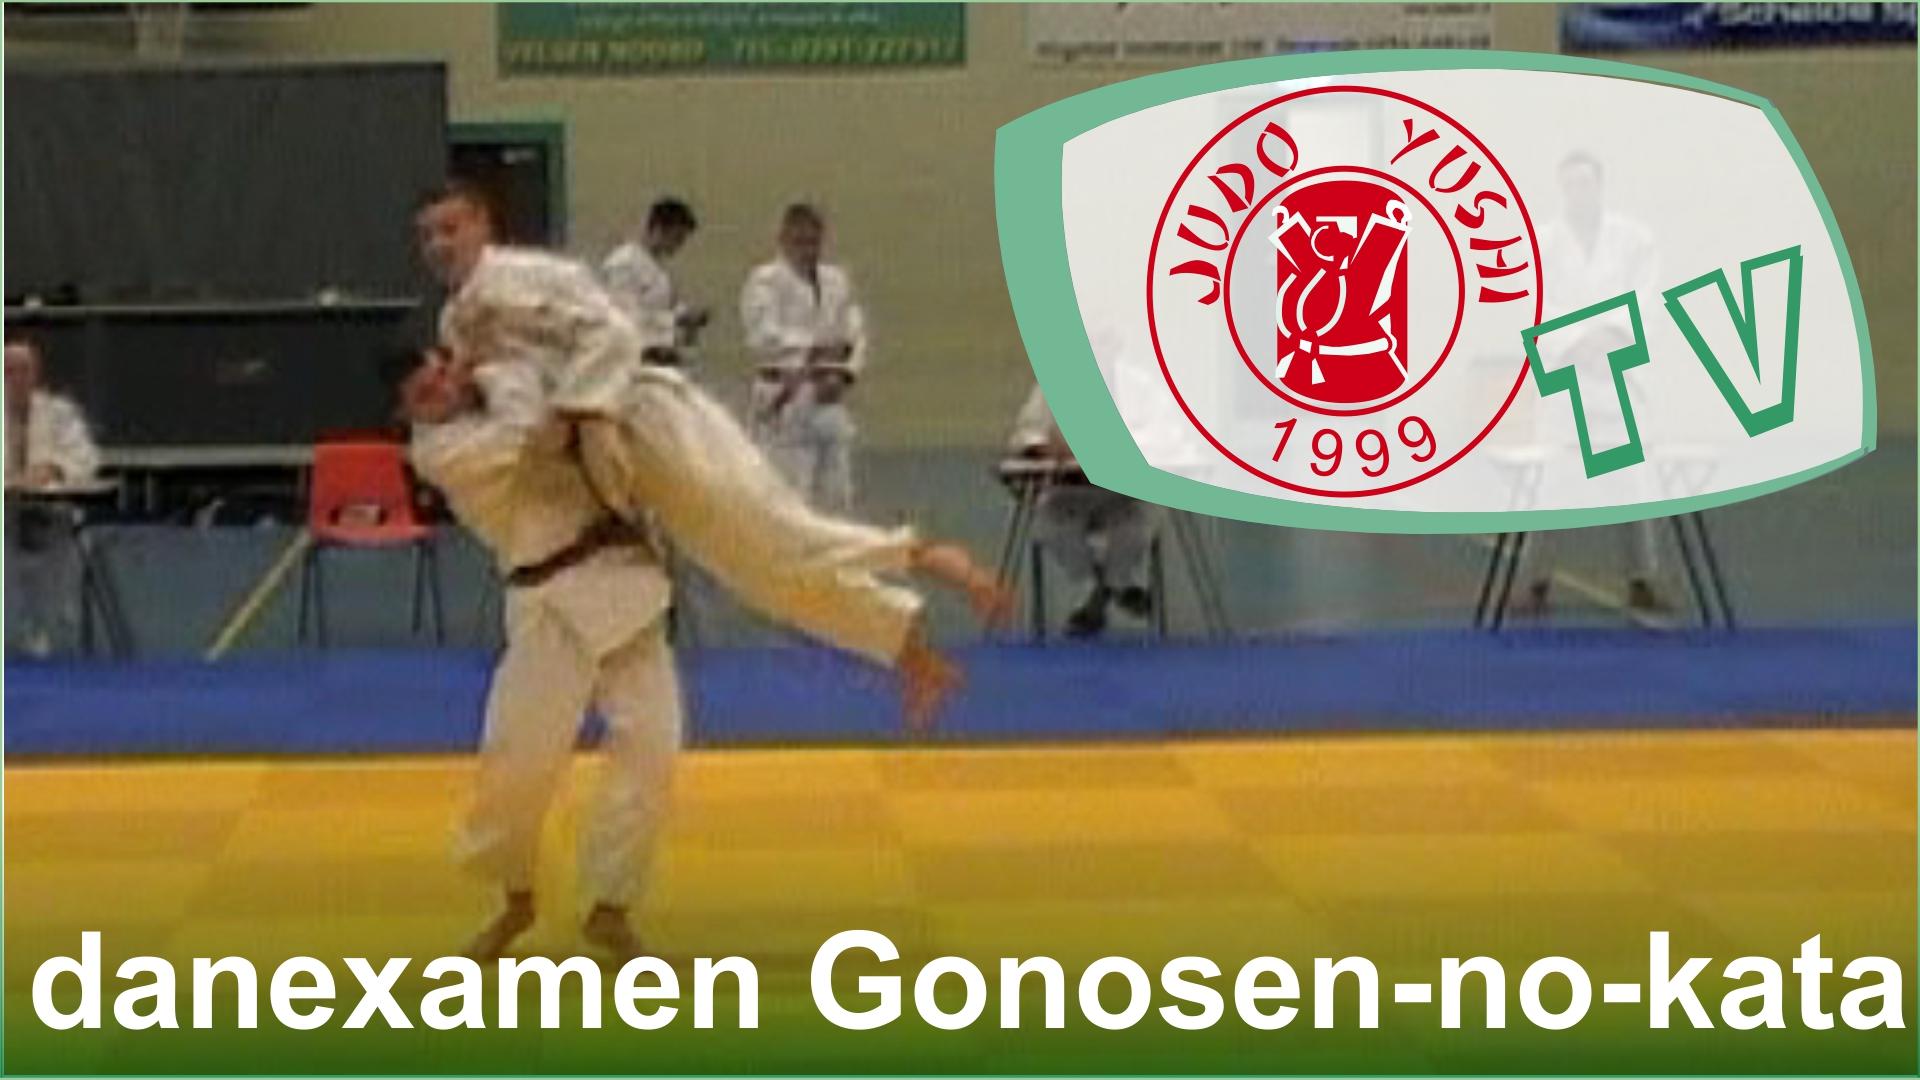 Kevin Snijders Judo Yushi gonosen-no-kata